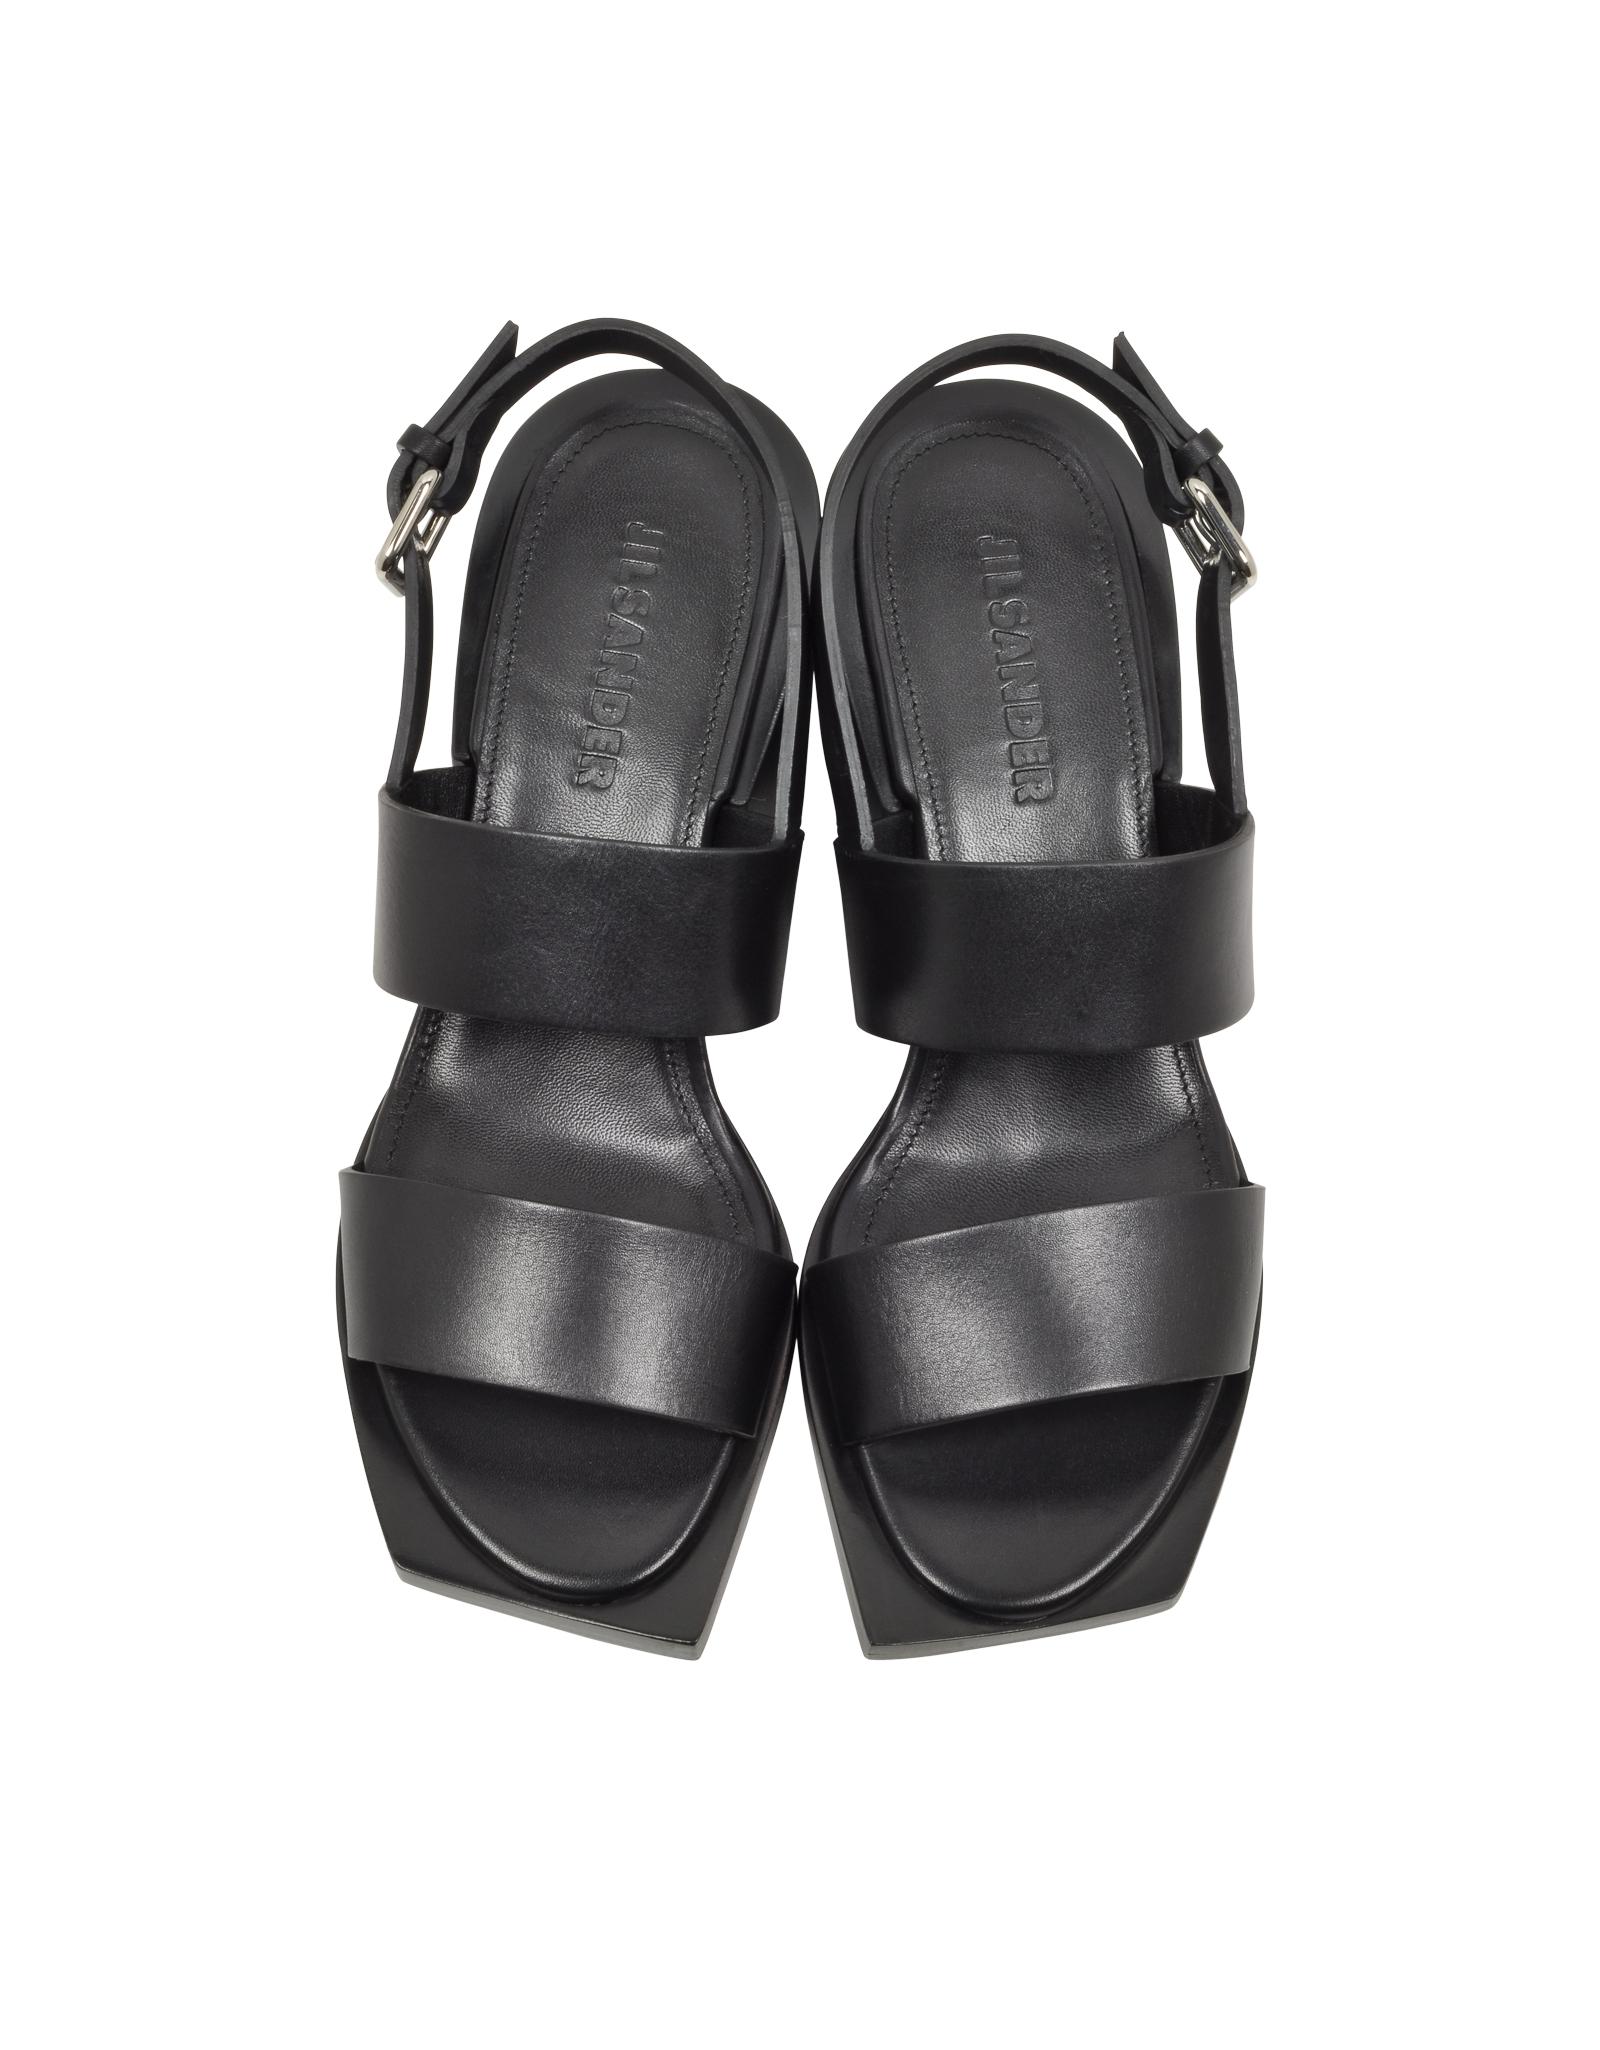 Jil Sander Studded Leather Sandals affordable outlet affordable free shipping store W7wjml